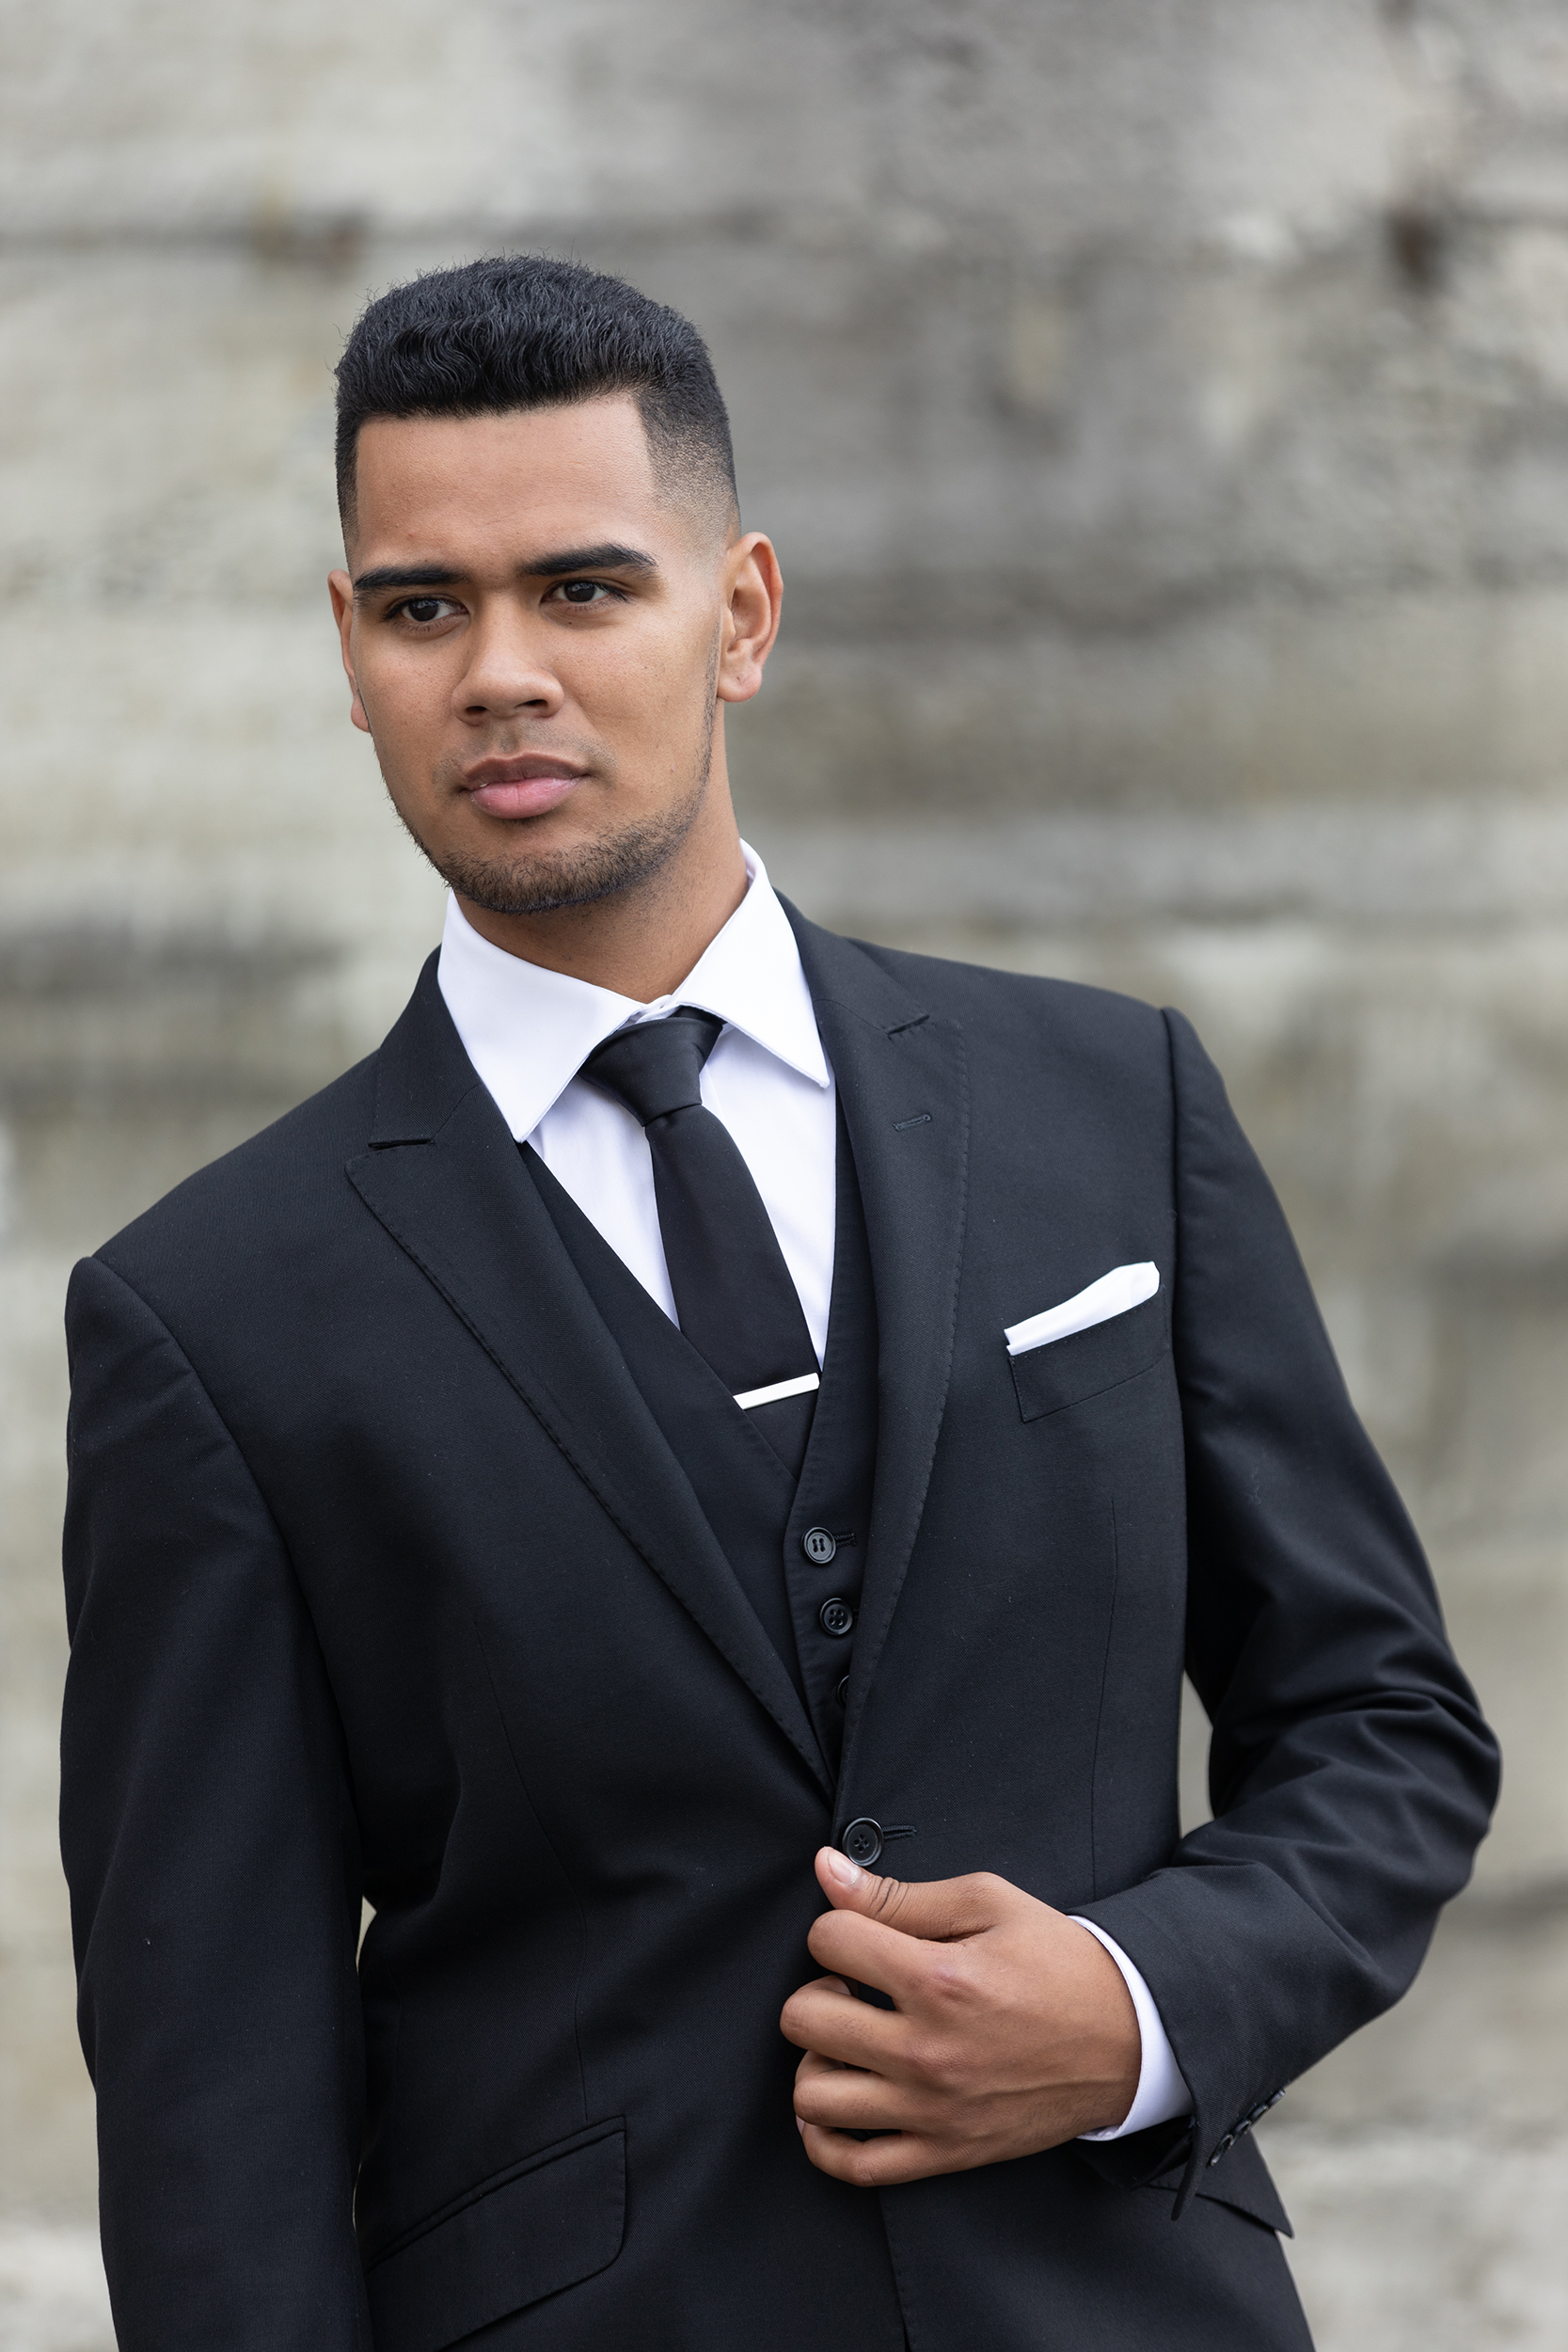 Romeo - Regular Fit- Black- Peak lapel- 2 button suit jacket- Straight leg suit trouserHire price $120 NZDReg: 88—132Short: 88—112Tall: 88—116